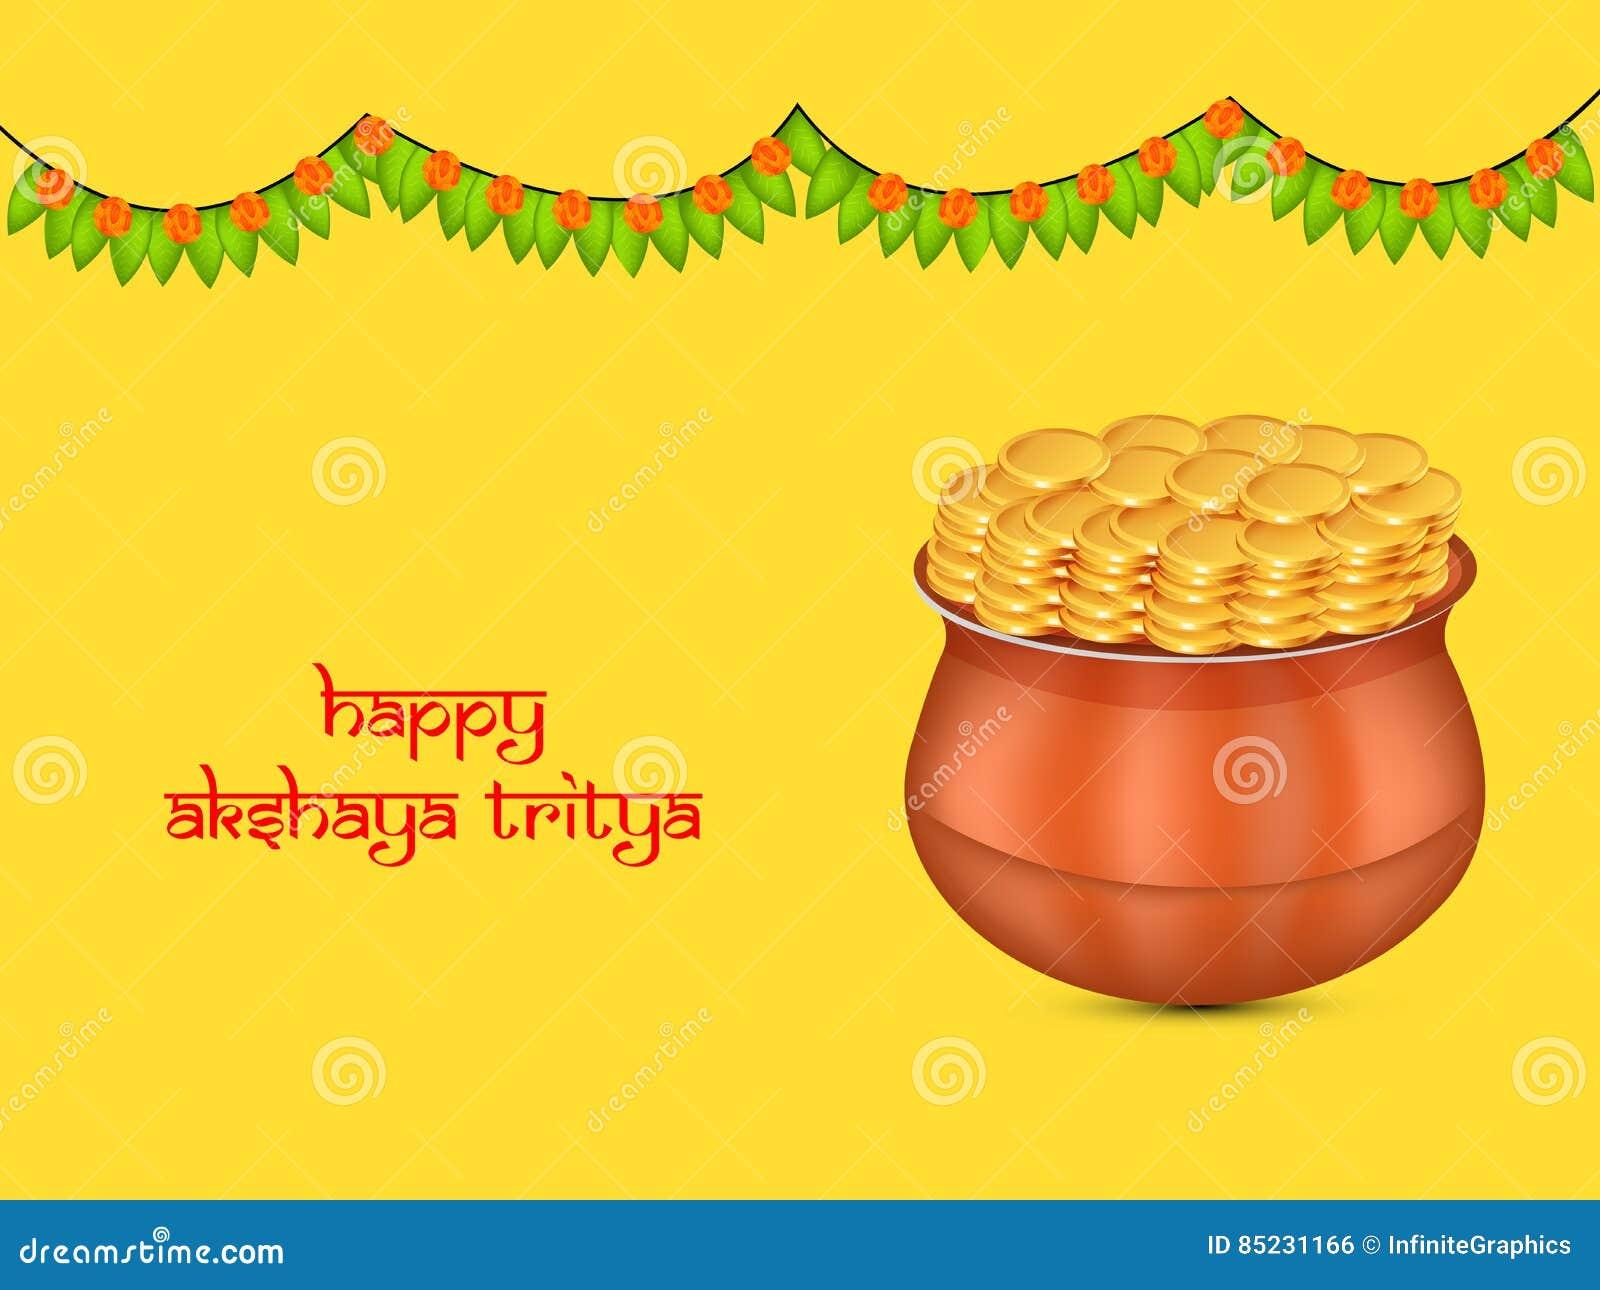 Akshaya Tritiya Background Vector Illustration Cartoondealercom